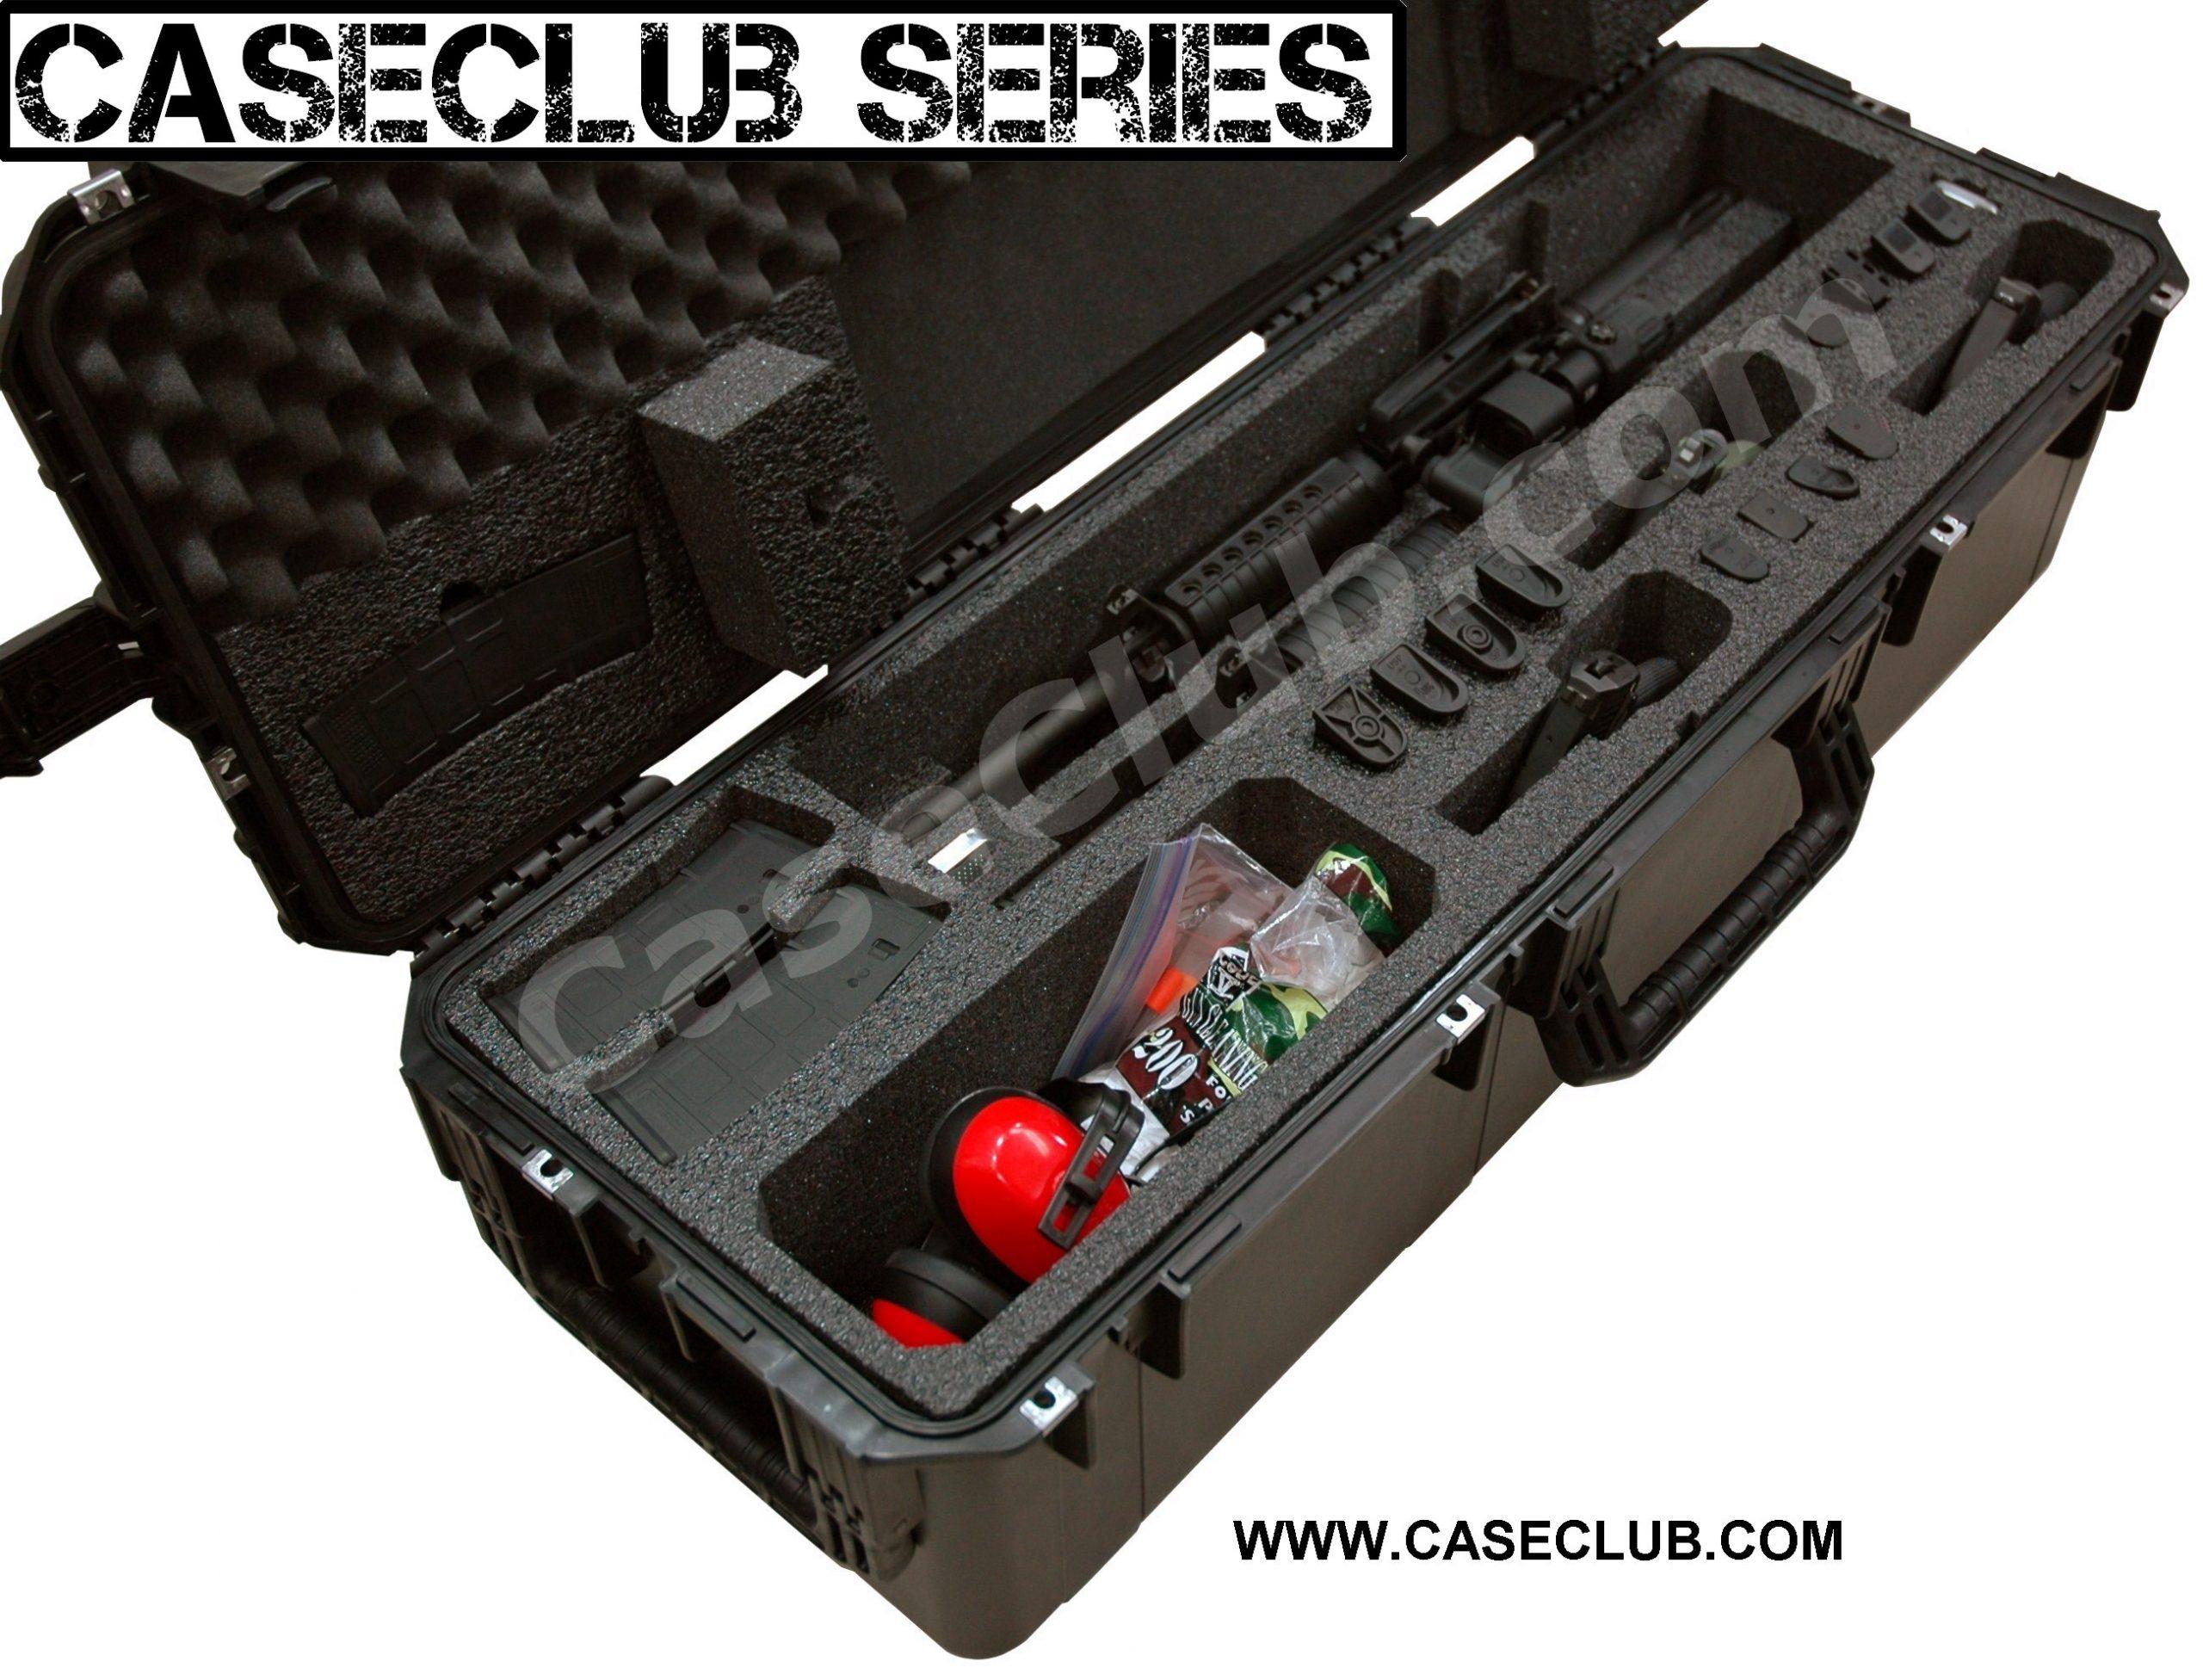 Case Club Closed Cell Military Grade Pistol Case Foam 18 x 16 x 1.5 Inches